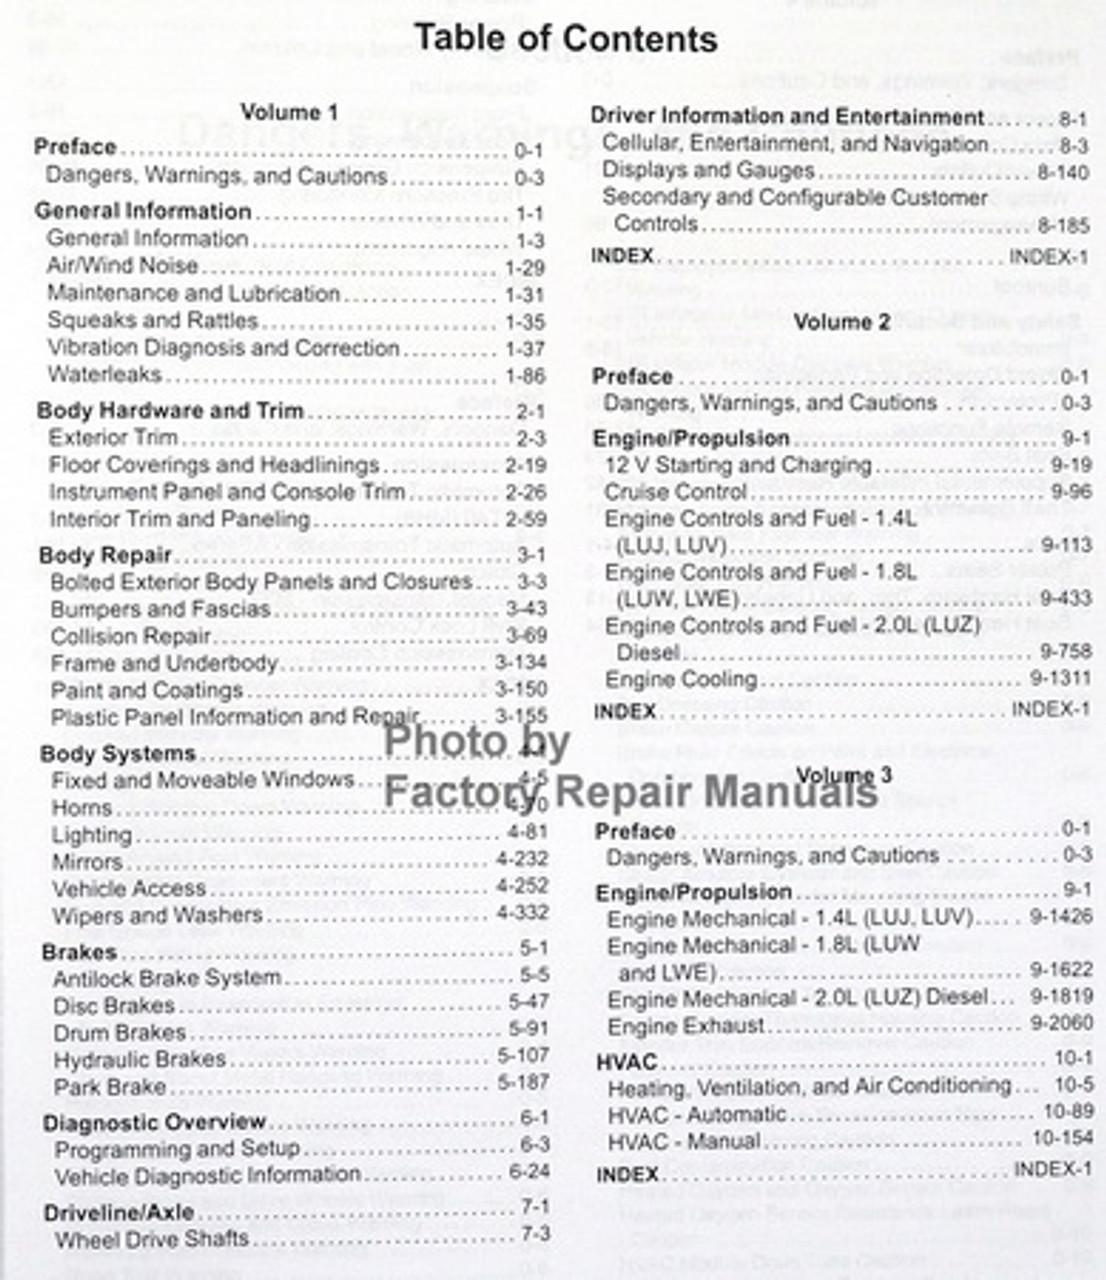 2015 Chevy Cruze Factory Service Manual Complete Set Original Shop Repair